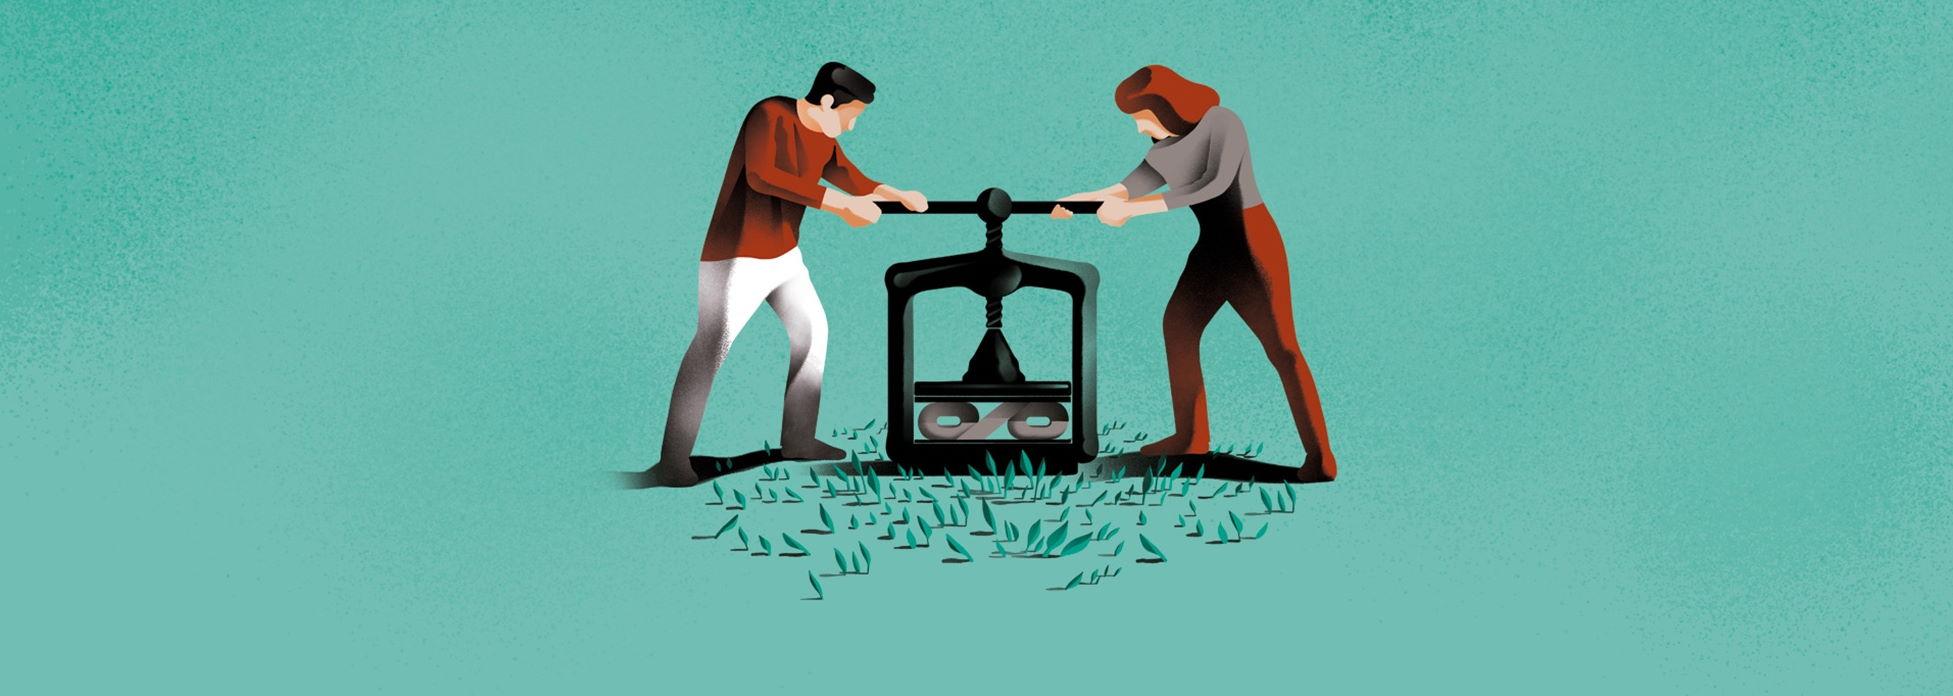 Financiële repressie